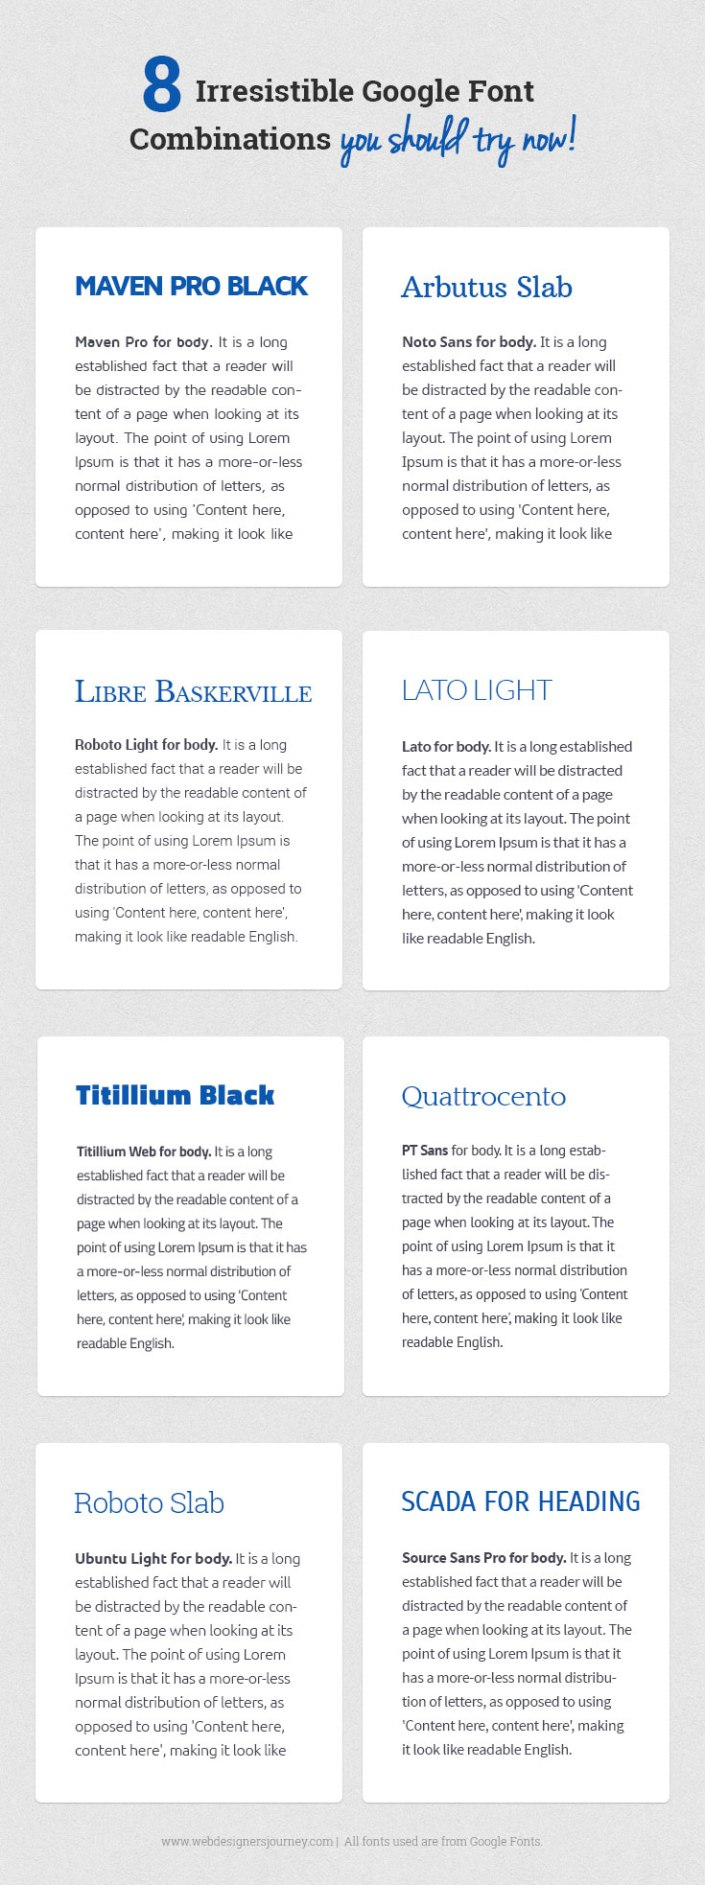 google-font-combination-2014